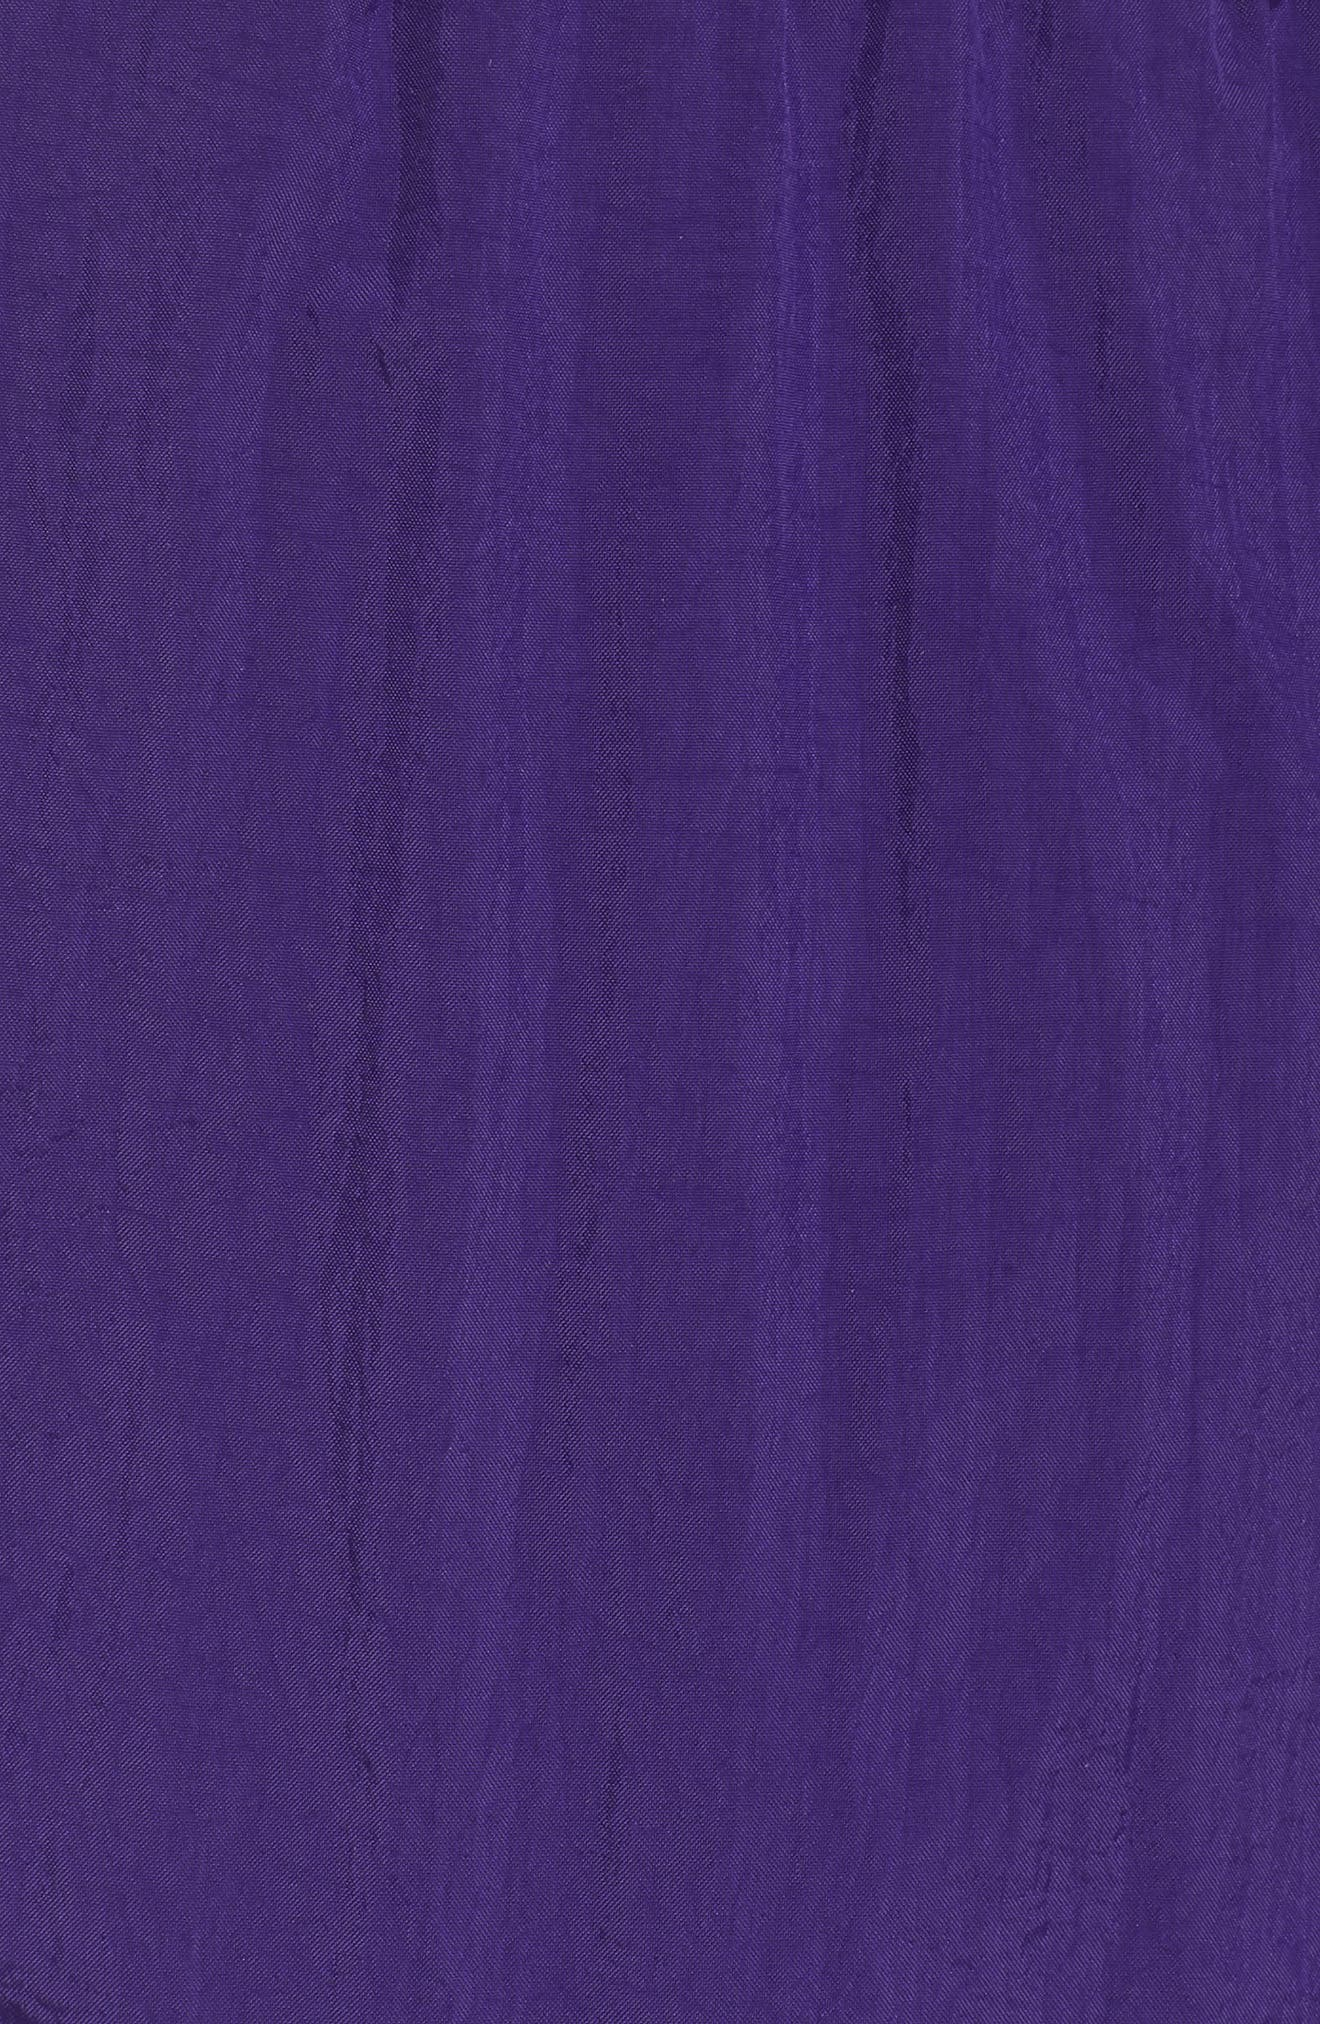 LA Lakers Tracksuit Pants,                             Alternate thumbnail 5, color,                             504